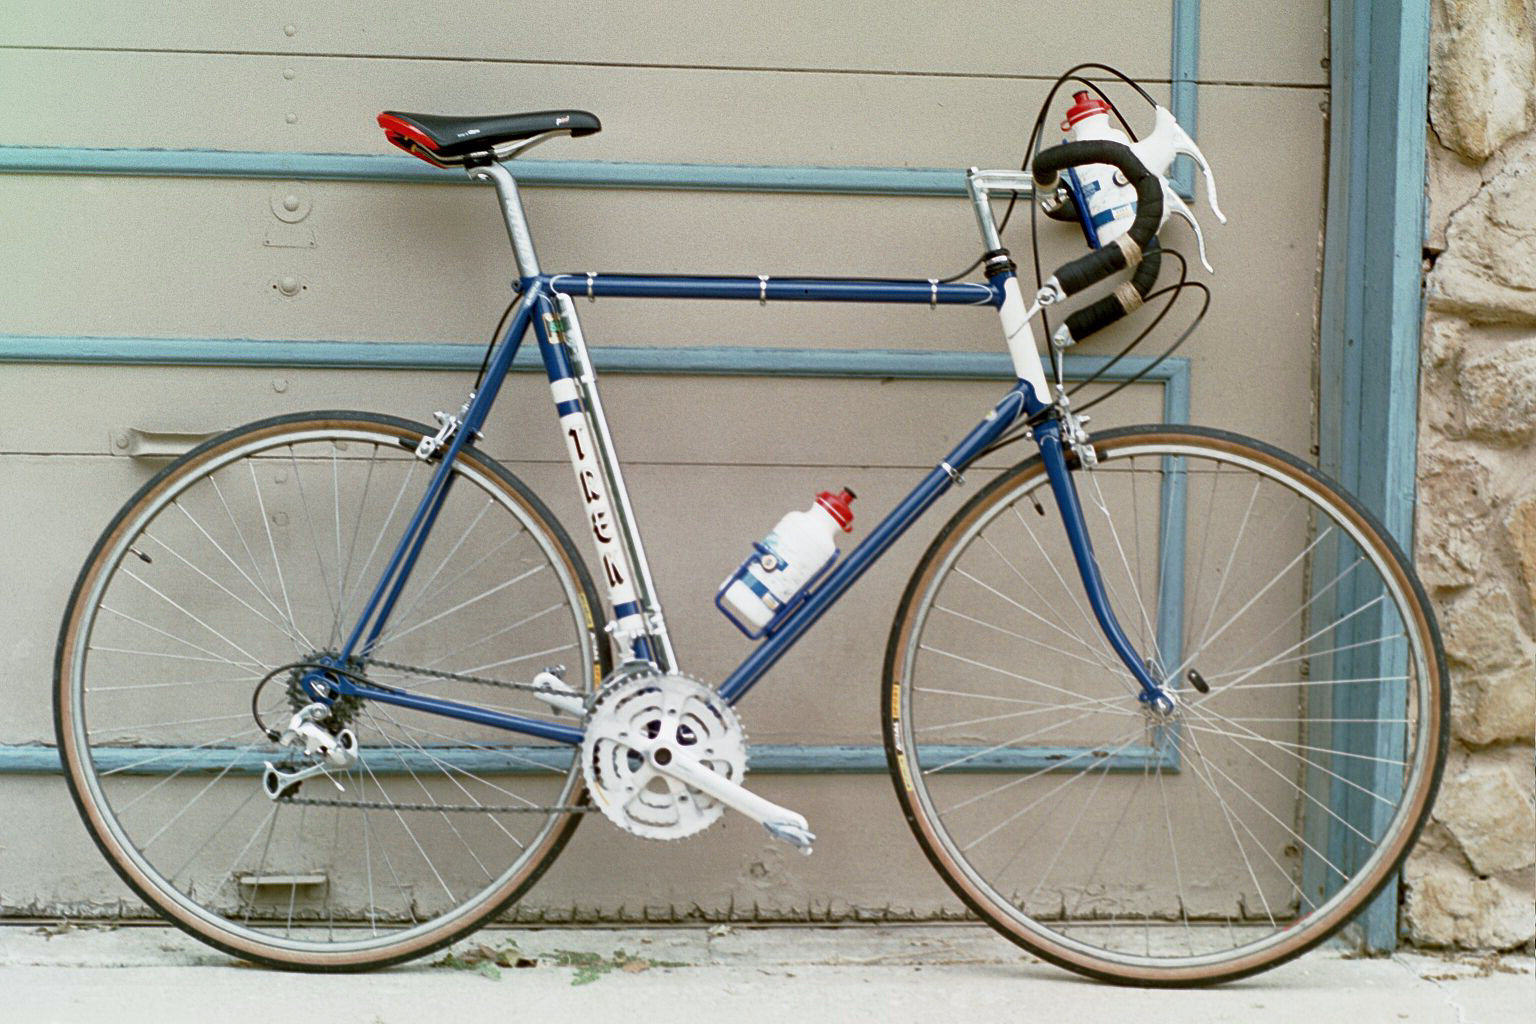 776e6c1d54c Vintage Trek Gallery - Tom Adam's Trek 730 Steel Road Bike